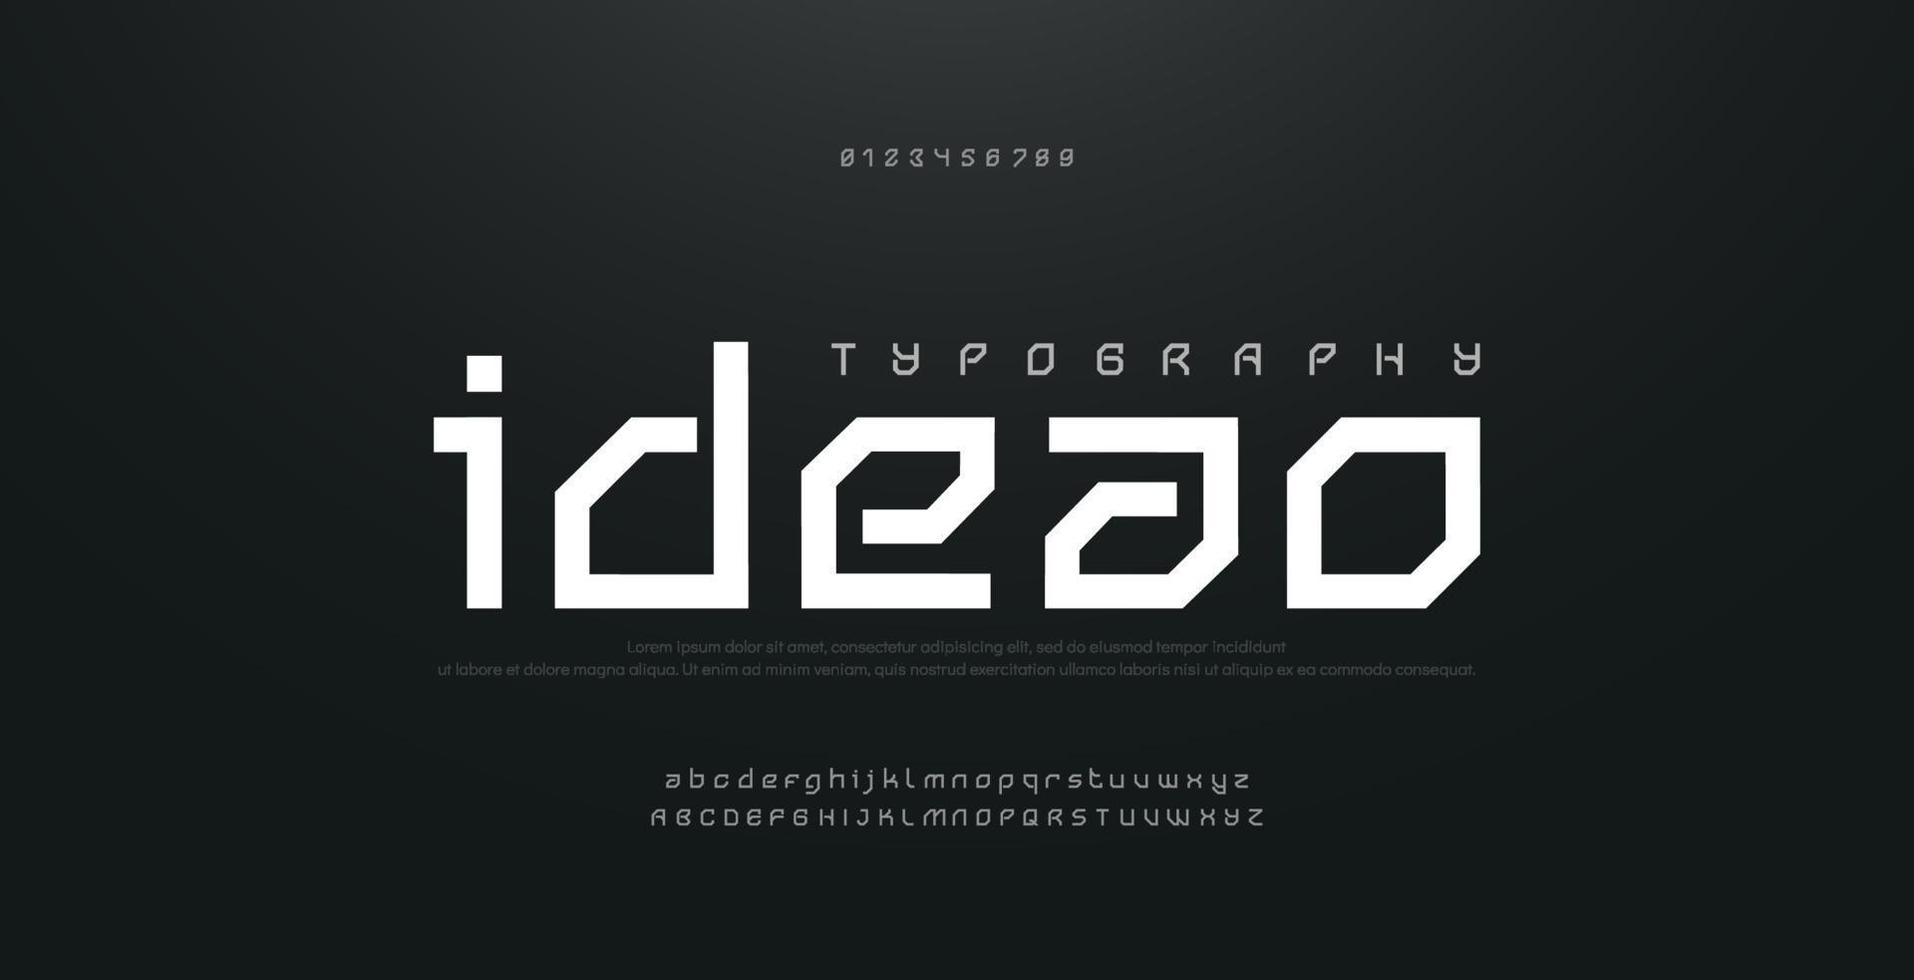 Abstract modern urban alphabet fonts. Typography sport technology fashion digital future creative logo square design font vector